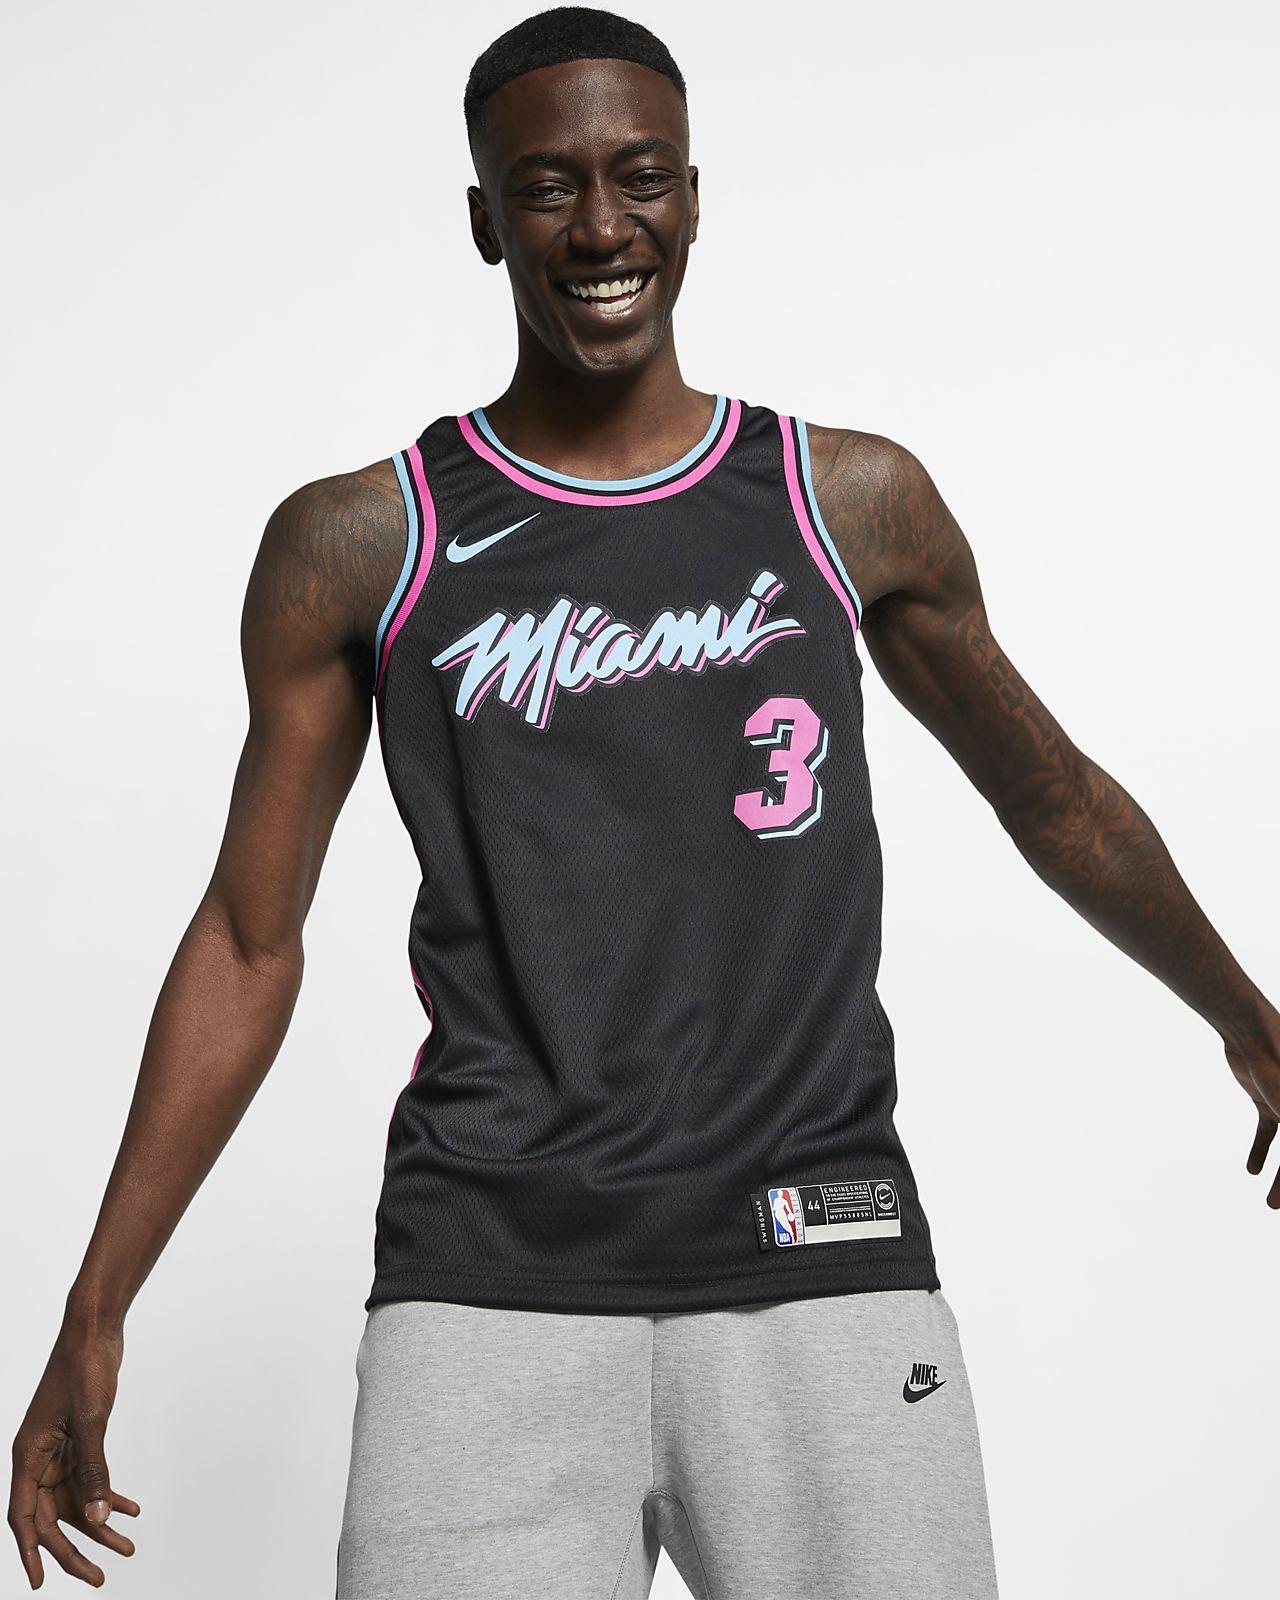 Dwyane Edition Connecté Wade City miami Nba Nike Maillot Swingman 7A6xYqtx